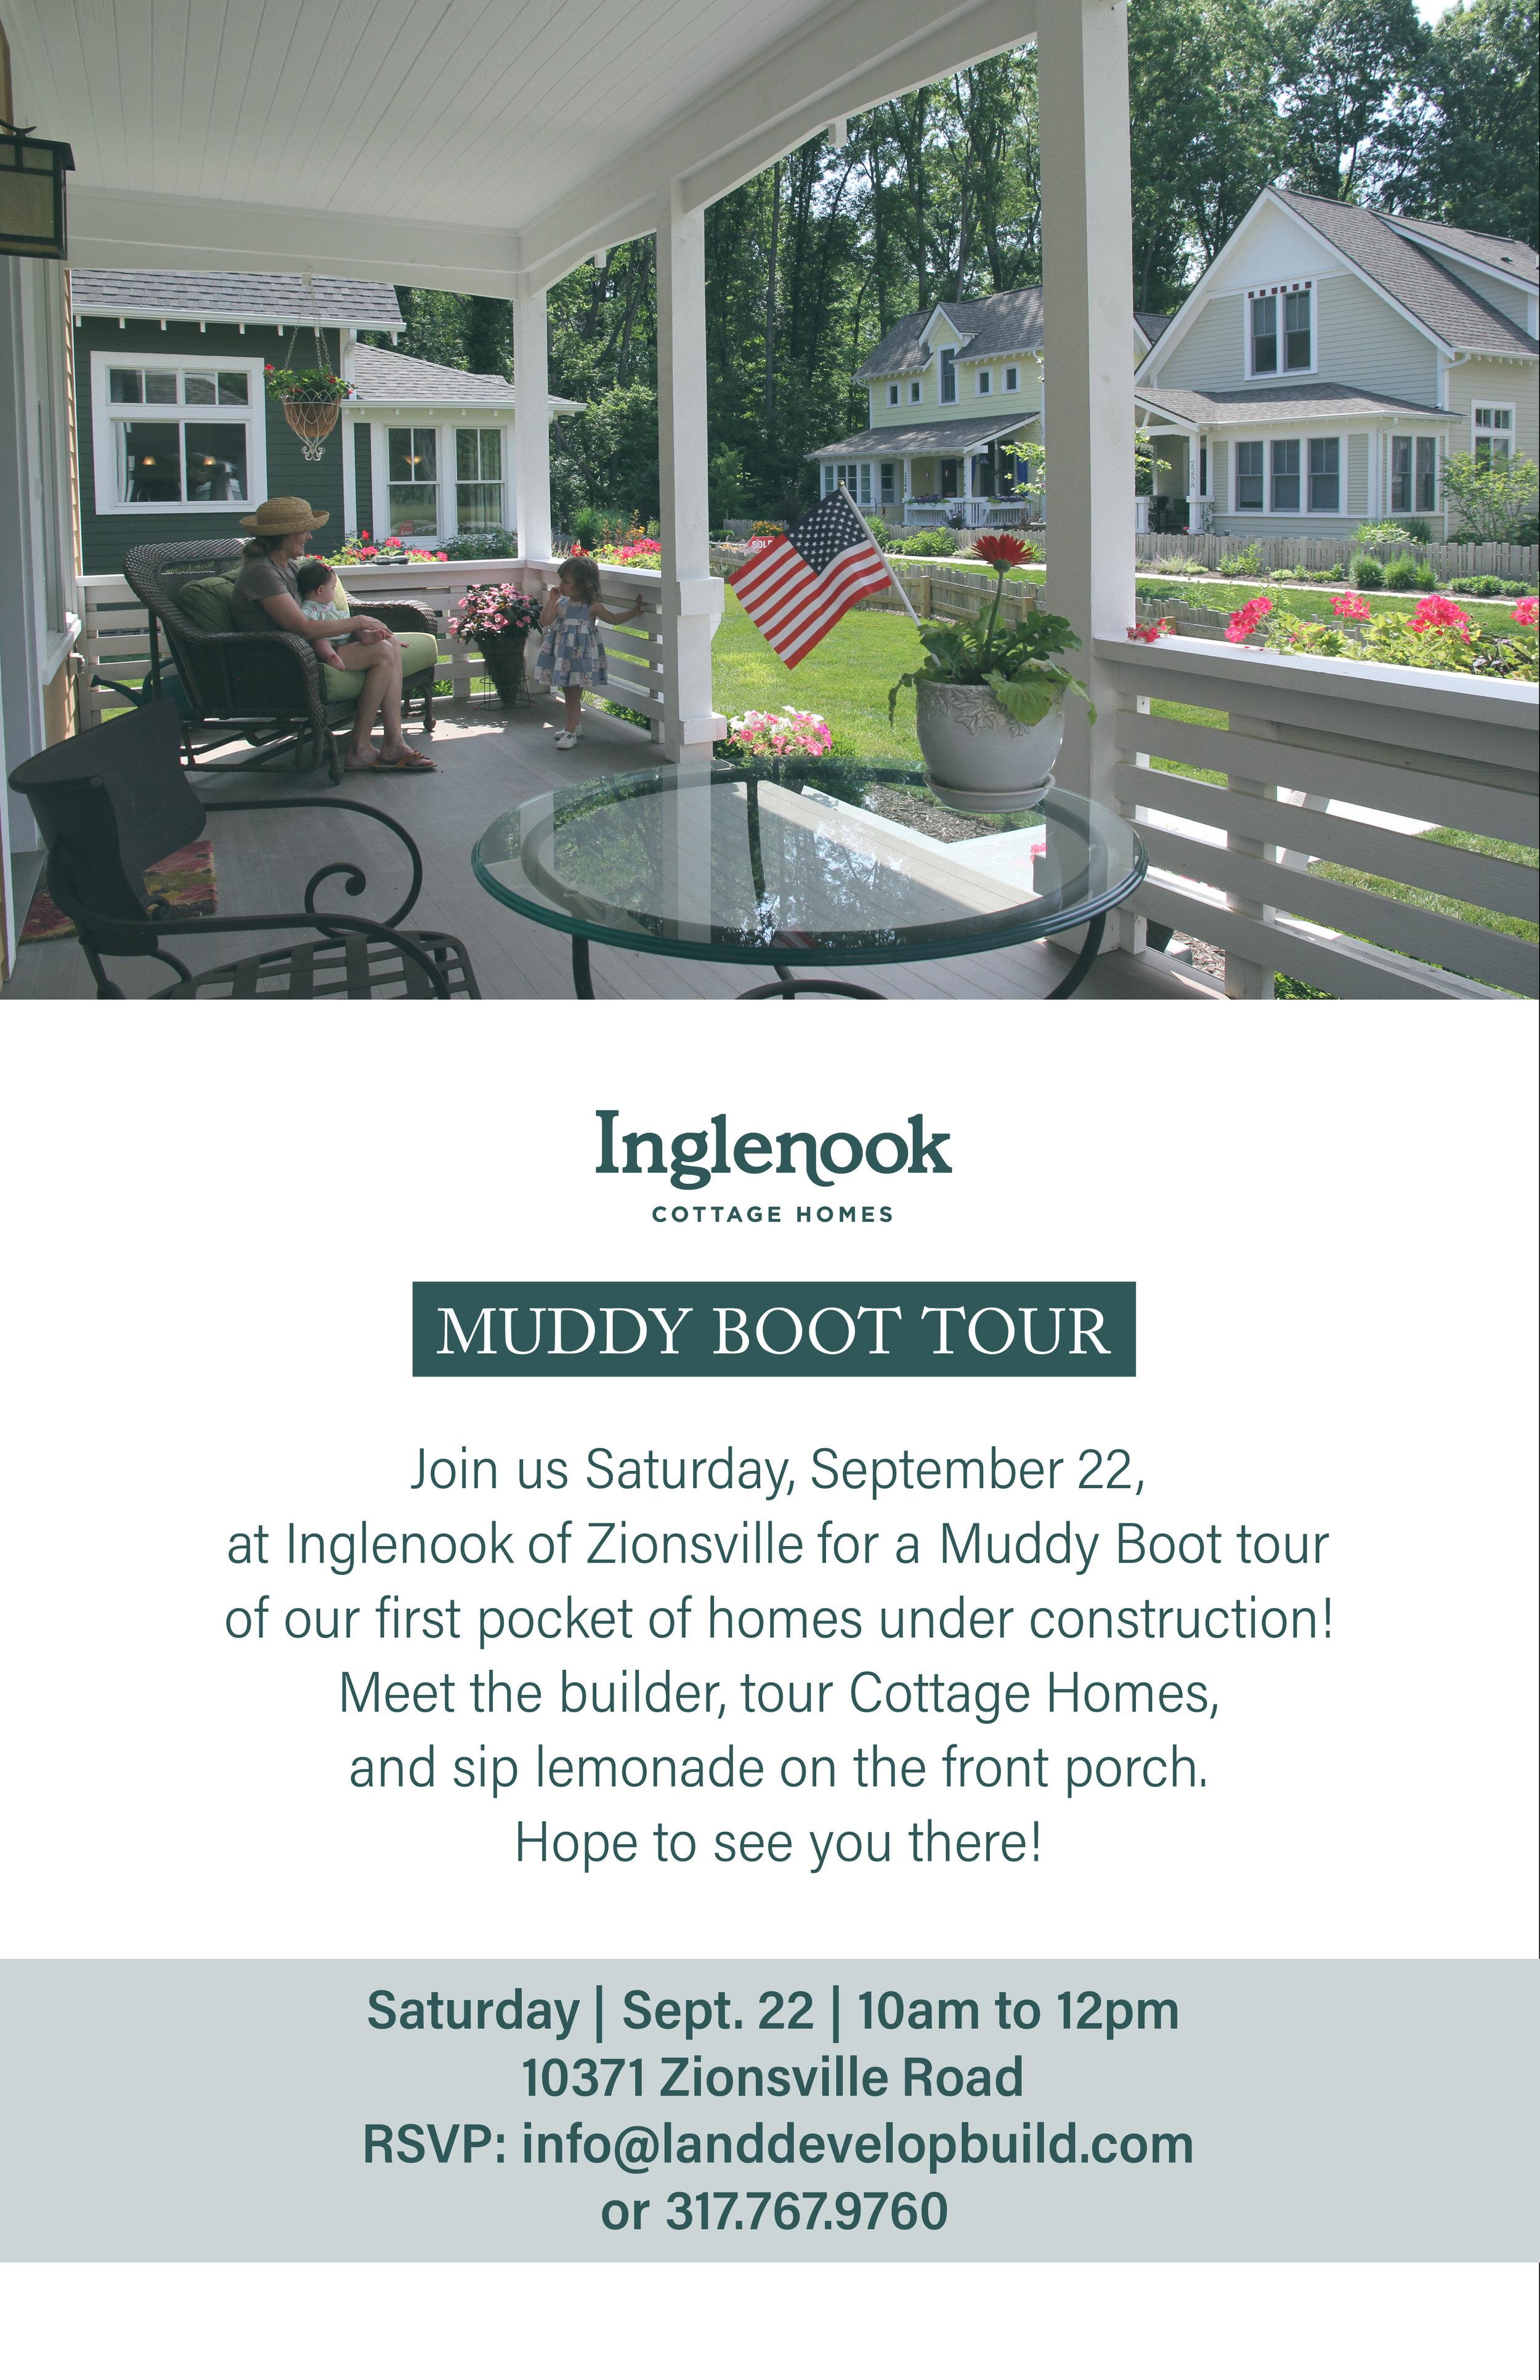 Inglenook of Zionsville Muddy Boot Tour